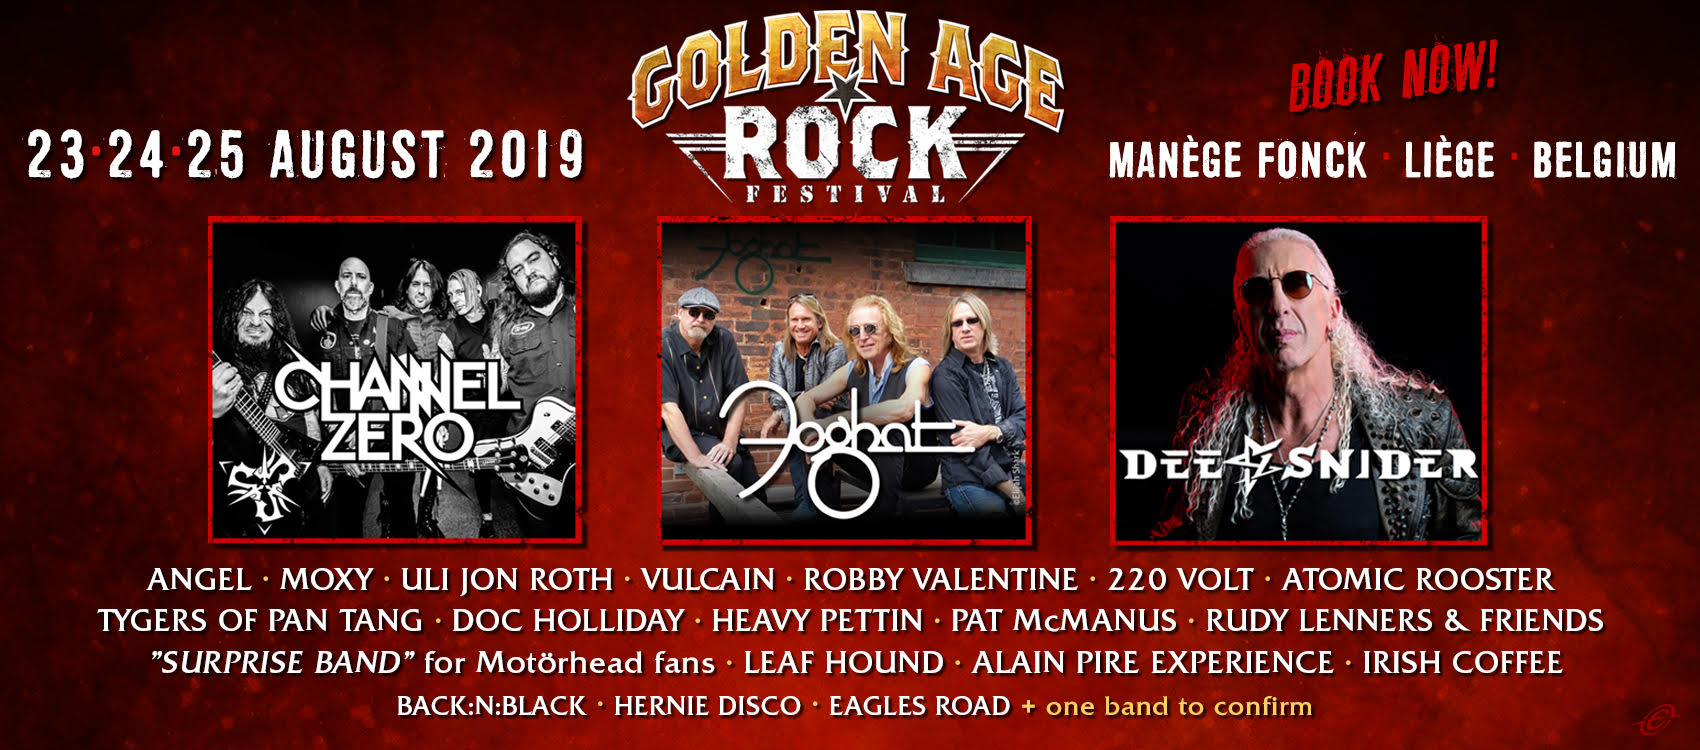 Golden Age Rock Festival 23-24-25 August 2019